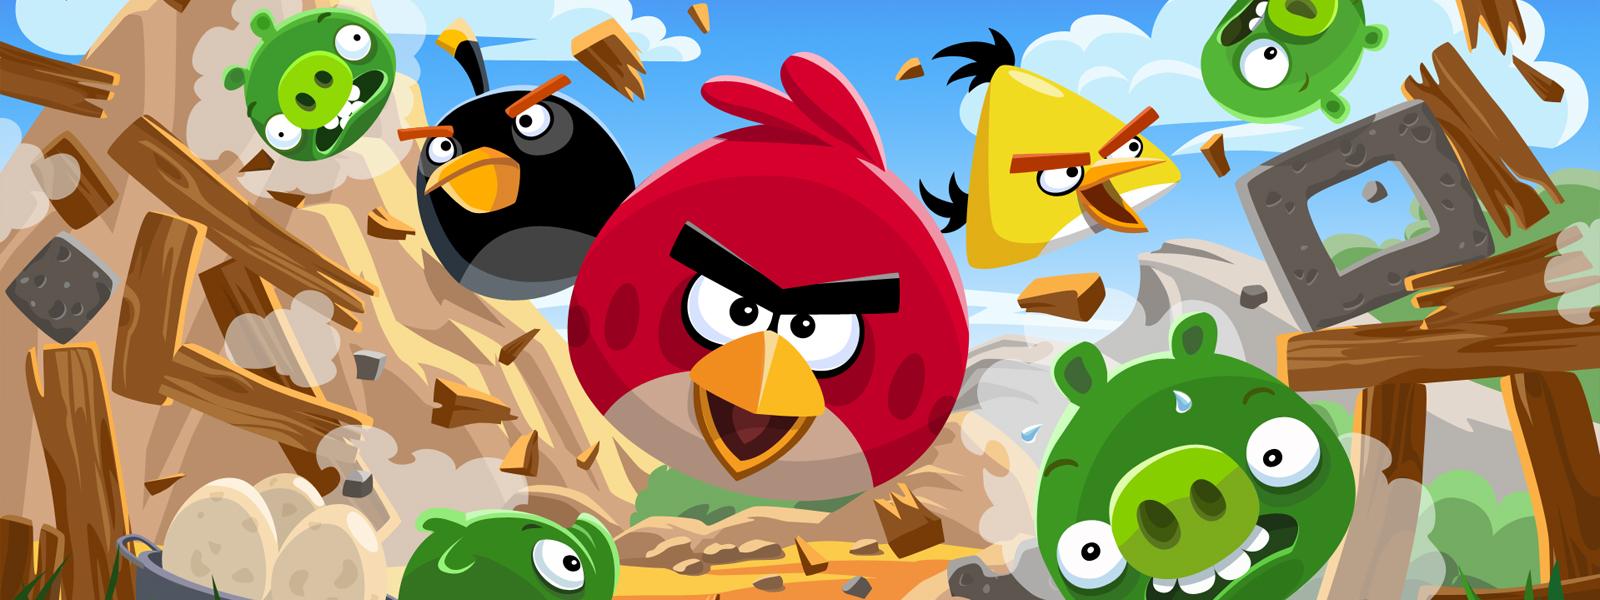 angry-birds-angry-birds-33464210-1600-600.jpg